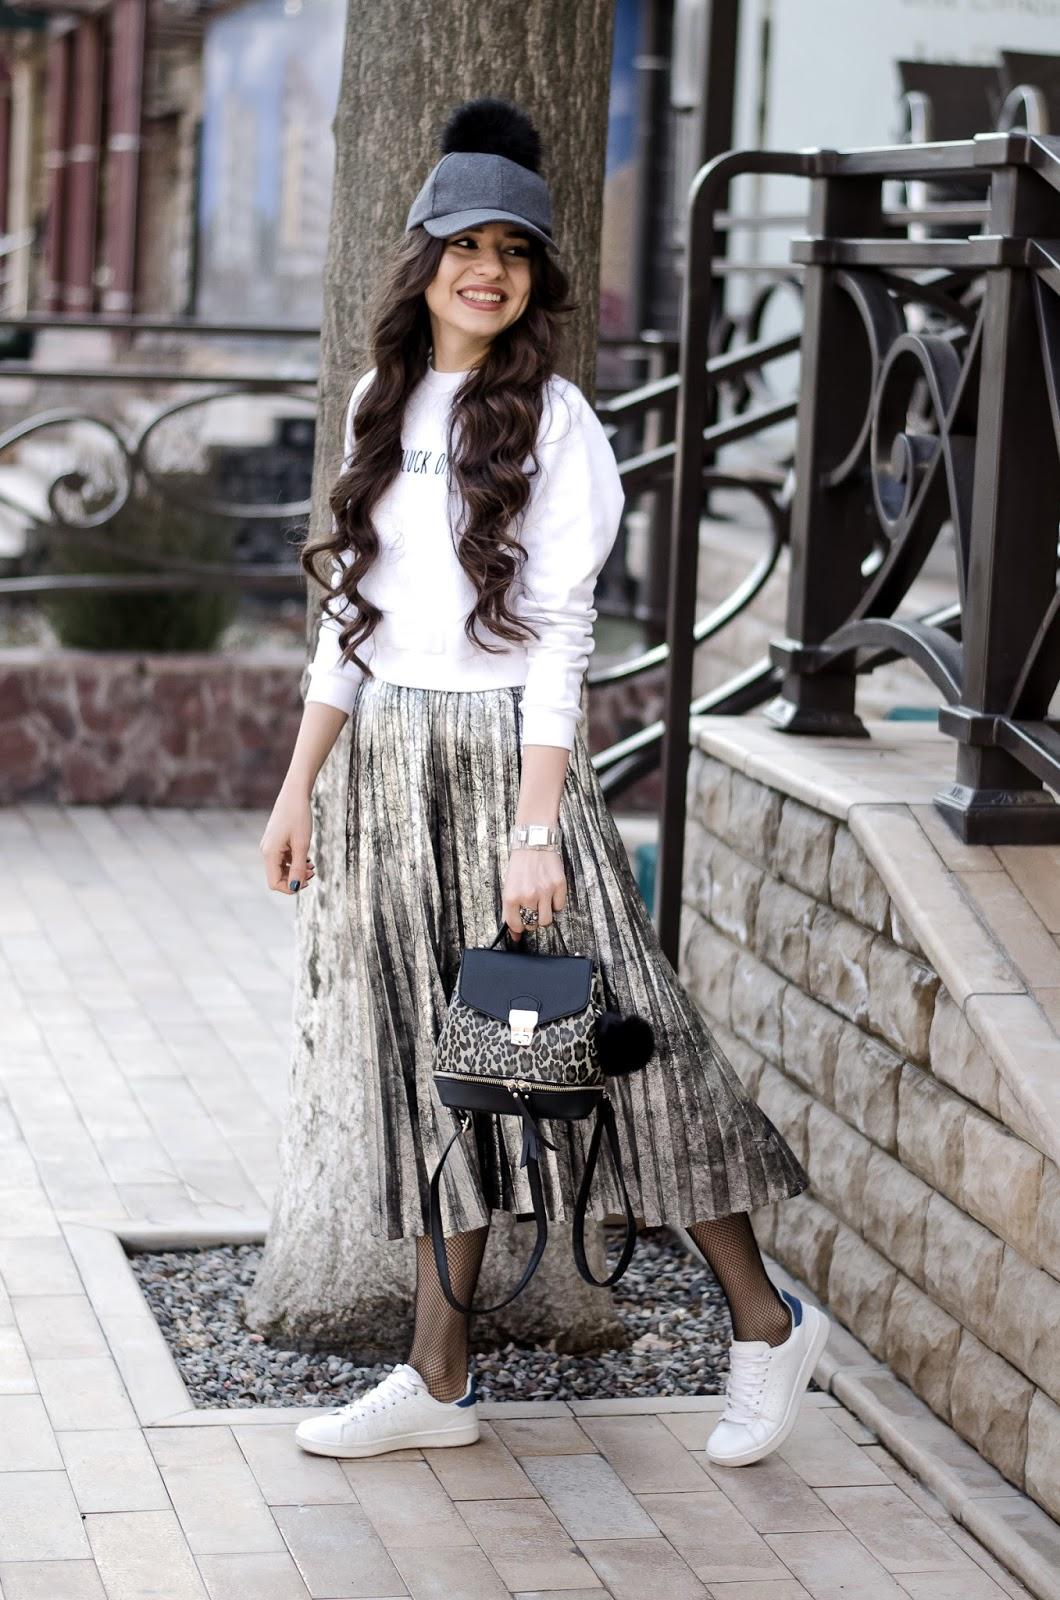 fashion-blogger-diyorasnotes-pleated-metallic-skirt-romwe-sweatshirt-asos-white-sneakers